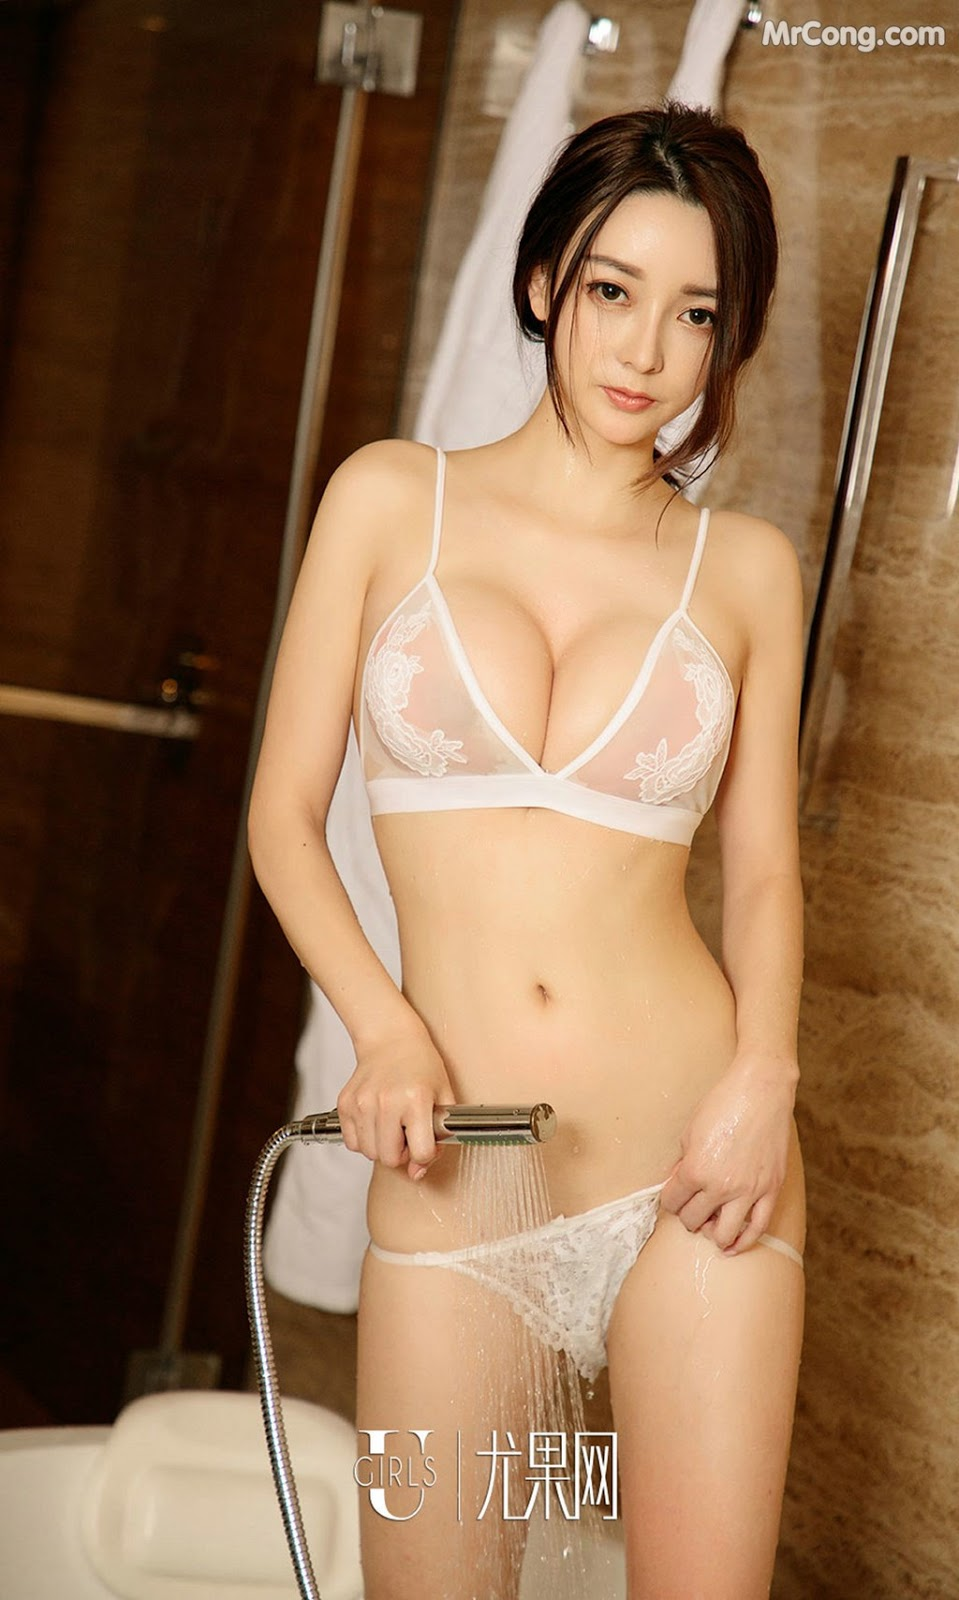 Hot girls Bei La new porn model playing underware